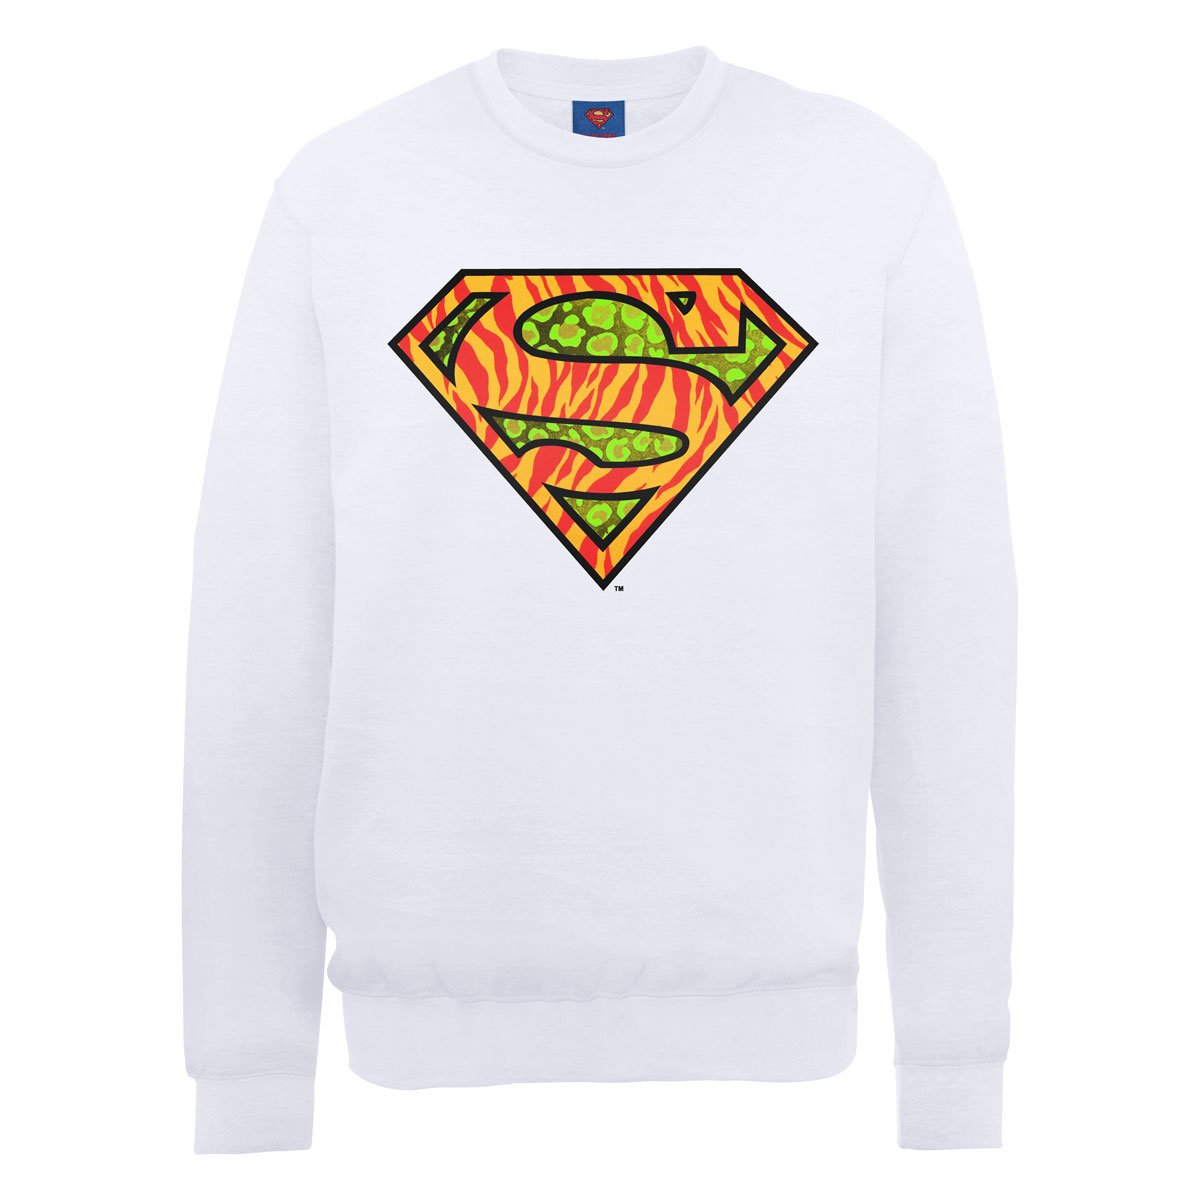 Mens DC0001036 DC Comics Official Superman Wild Logo Crew Neck Long Sleeve Sweatshirt DC Comics Low Shipping Cheap Online Cheap Sale Low Price Buy Online Authentic 64mt8